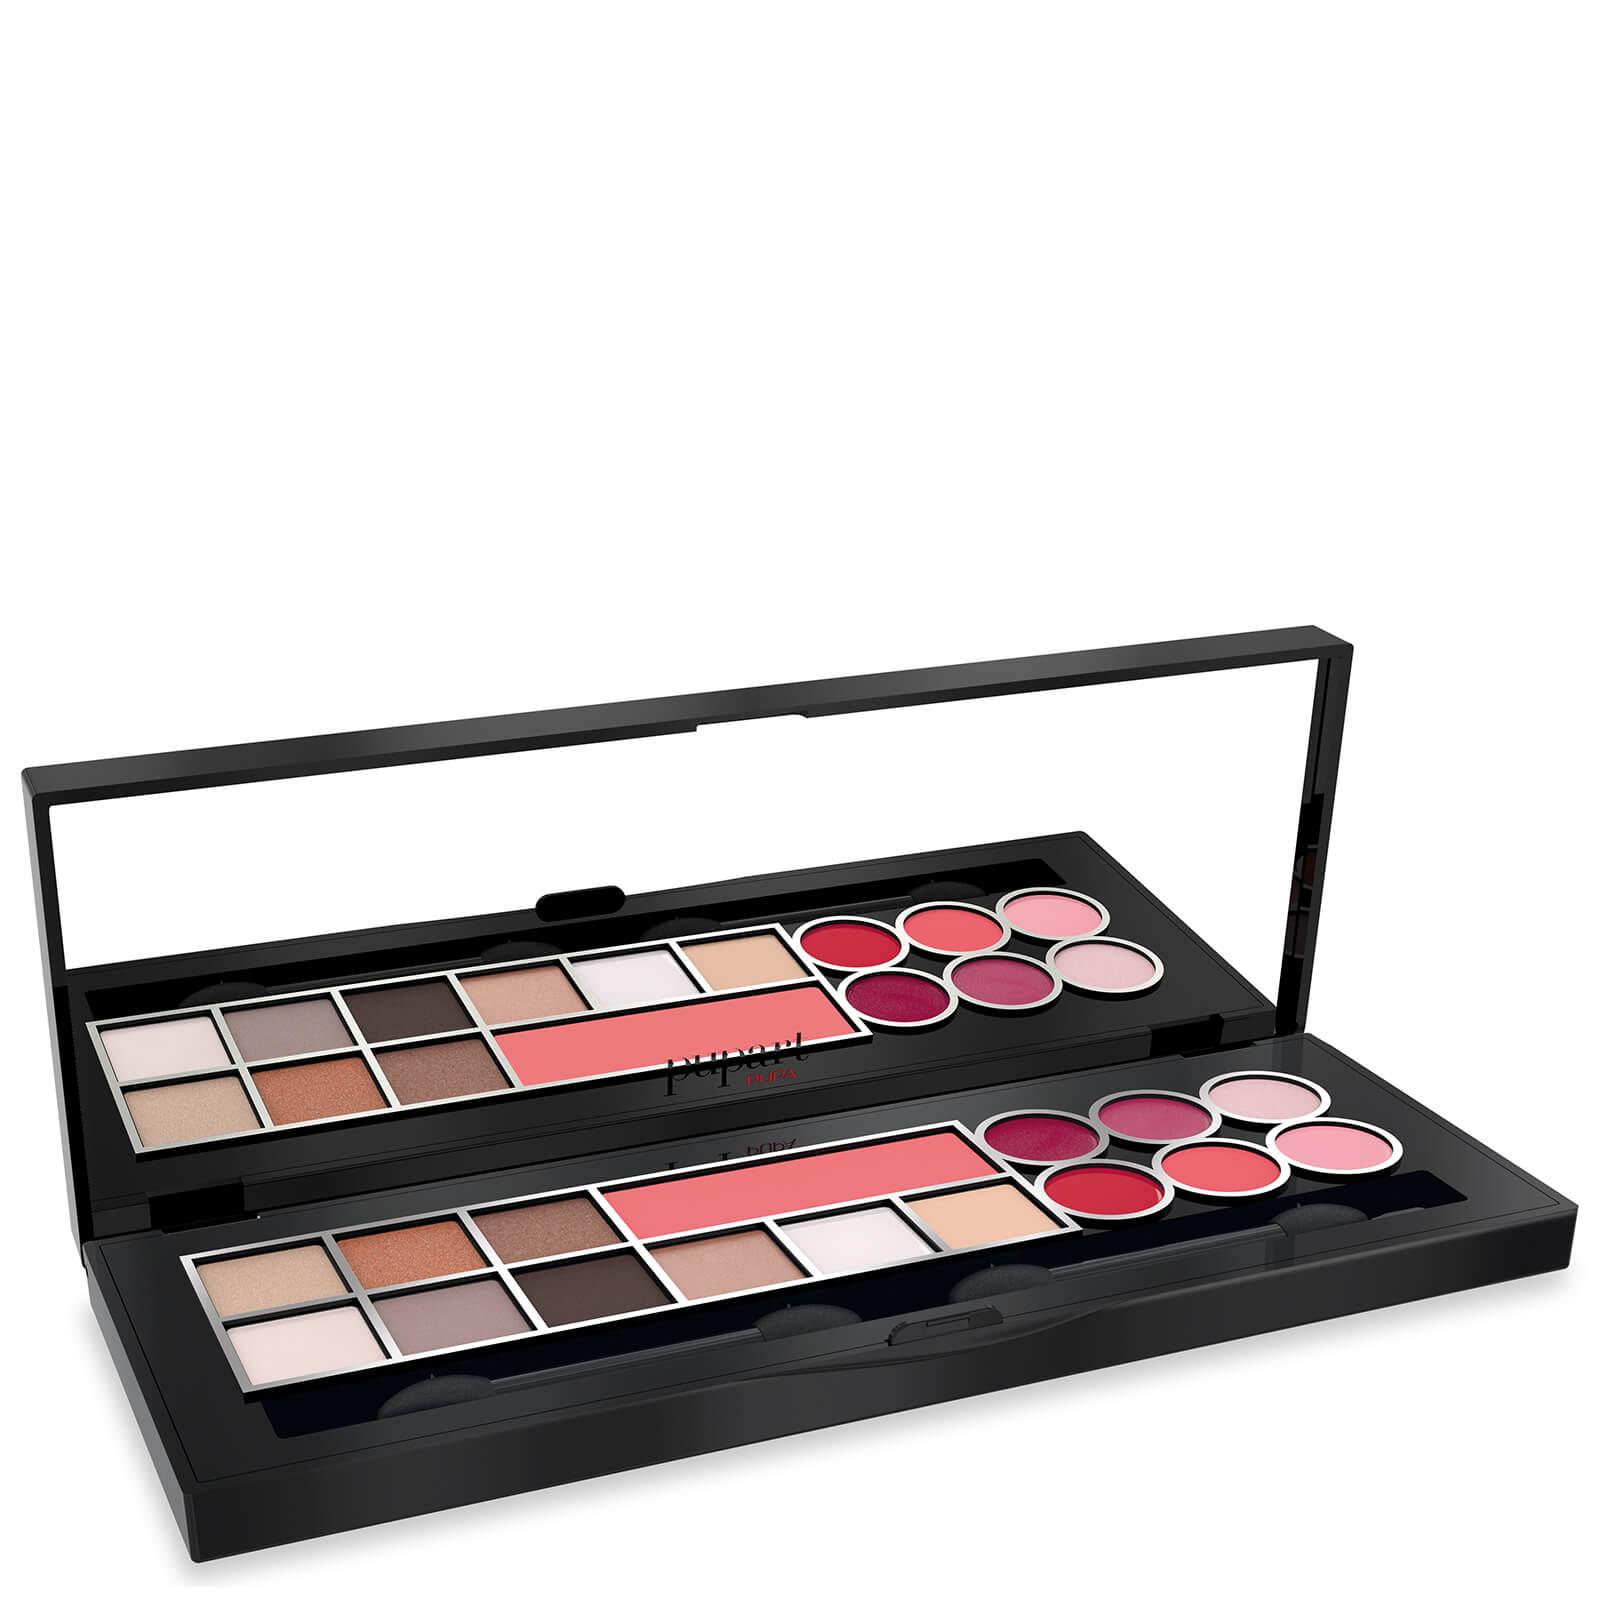 Pupa rt palette make-up cofanetto dorato - Warm Shades